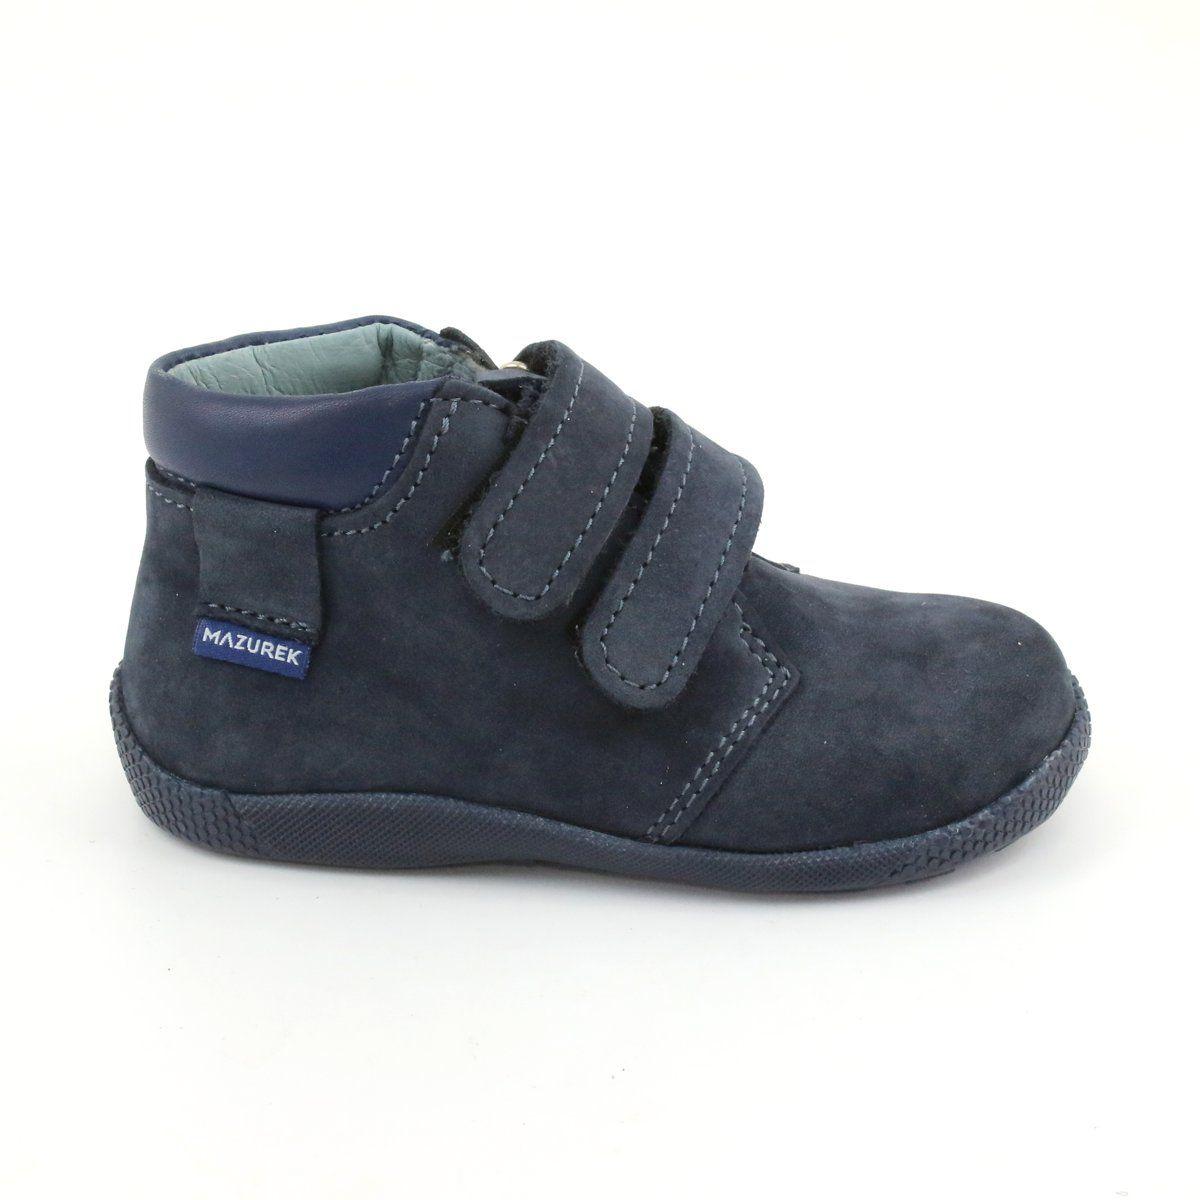 Boys Shoes With Velcro Mazurek 341 Navy Blue Navy Blue Shoes Boys Shoes Childrens Shoes